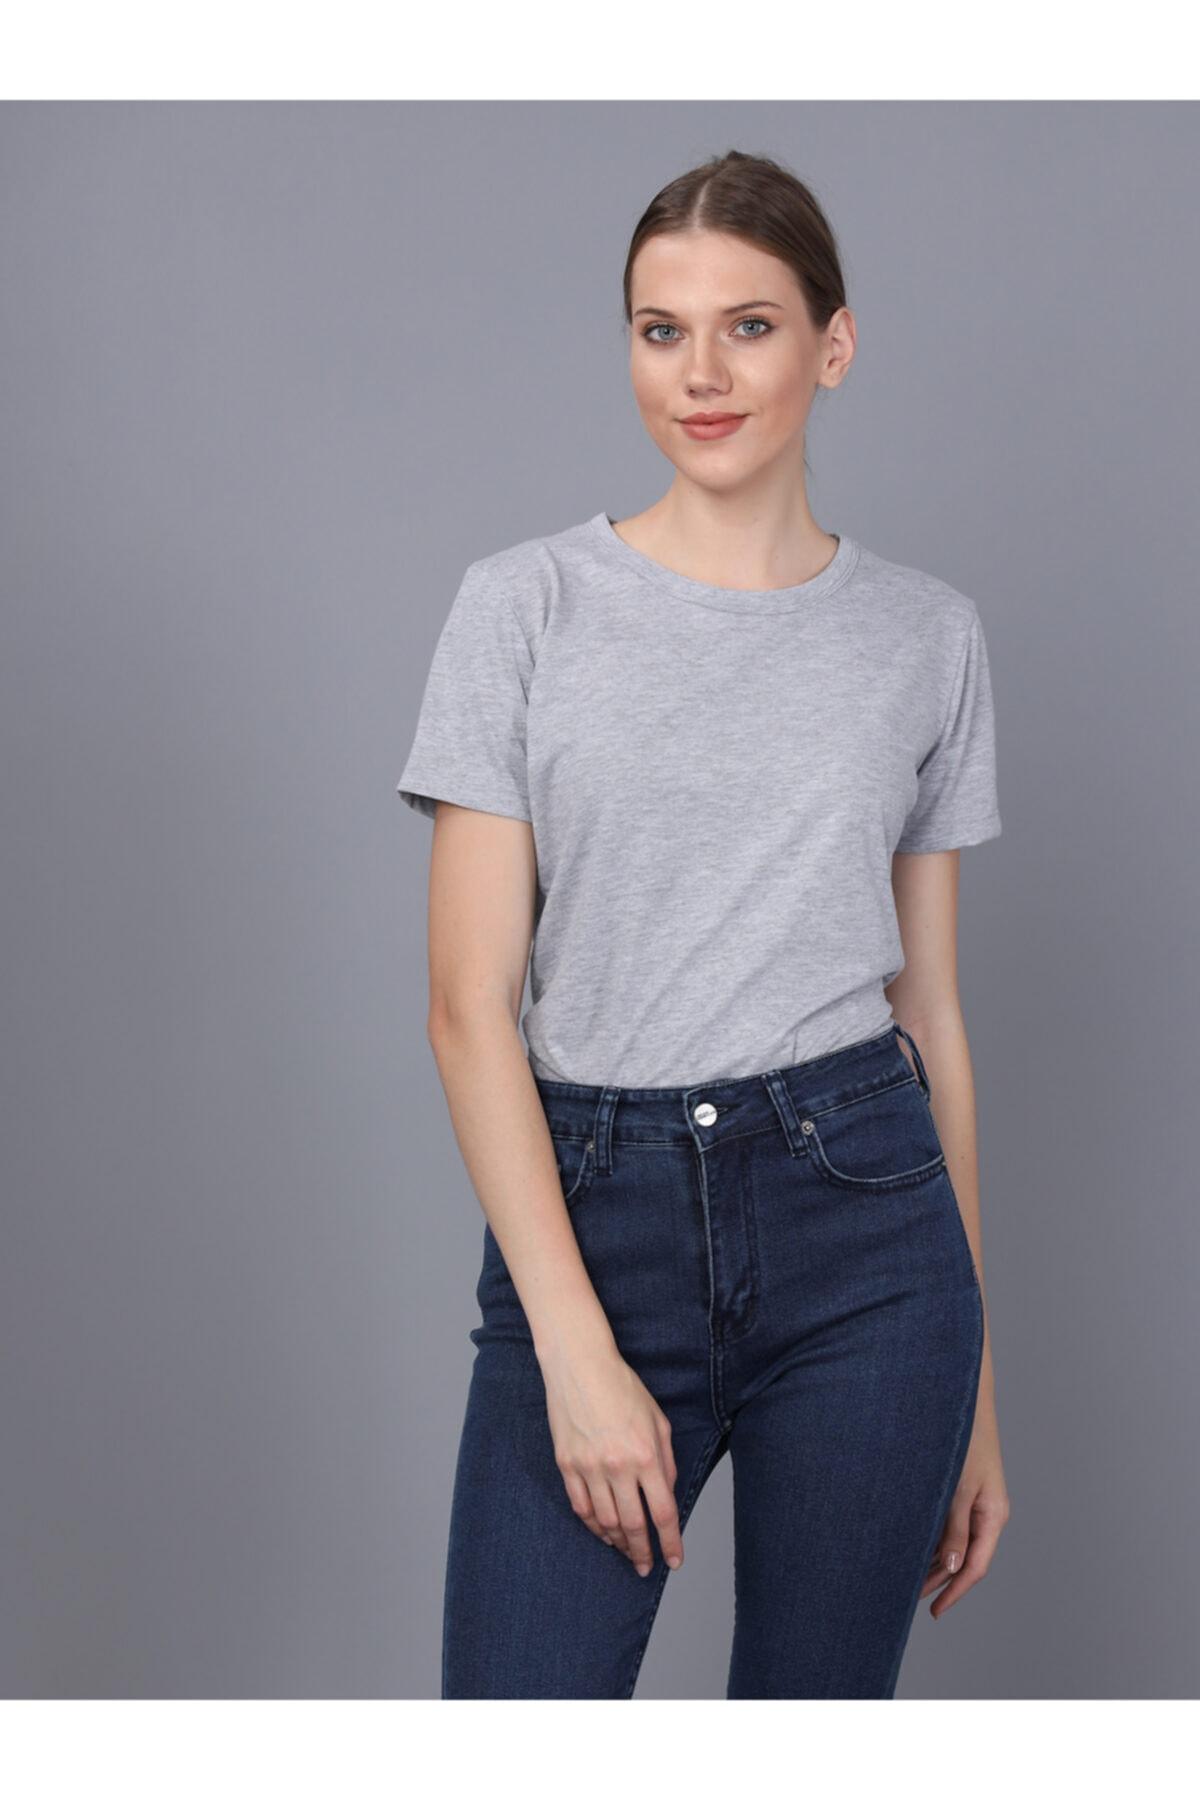 Basics&More Kadın Gri Bisiklet Yaka T-shirt 1